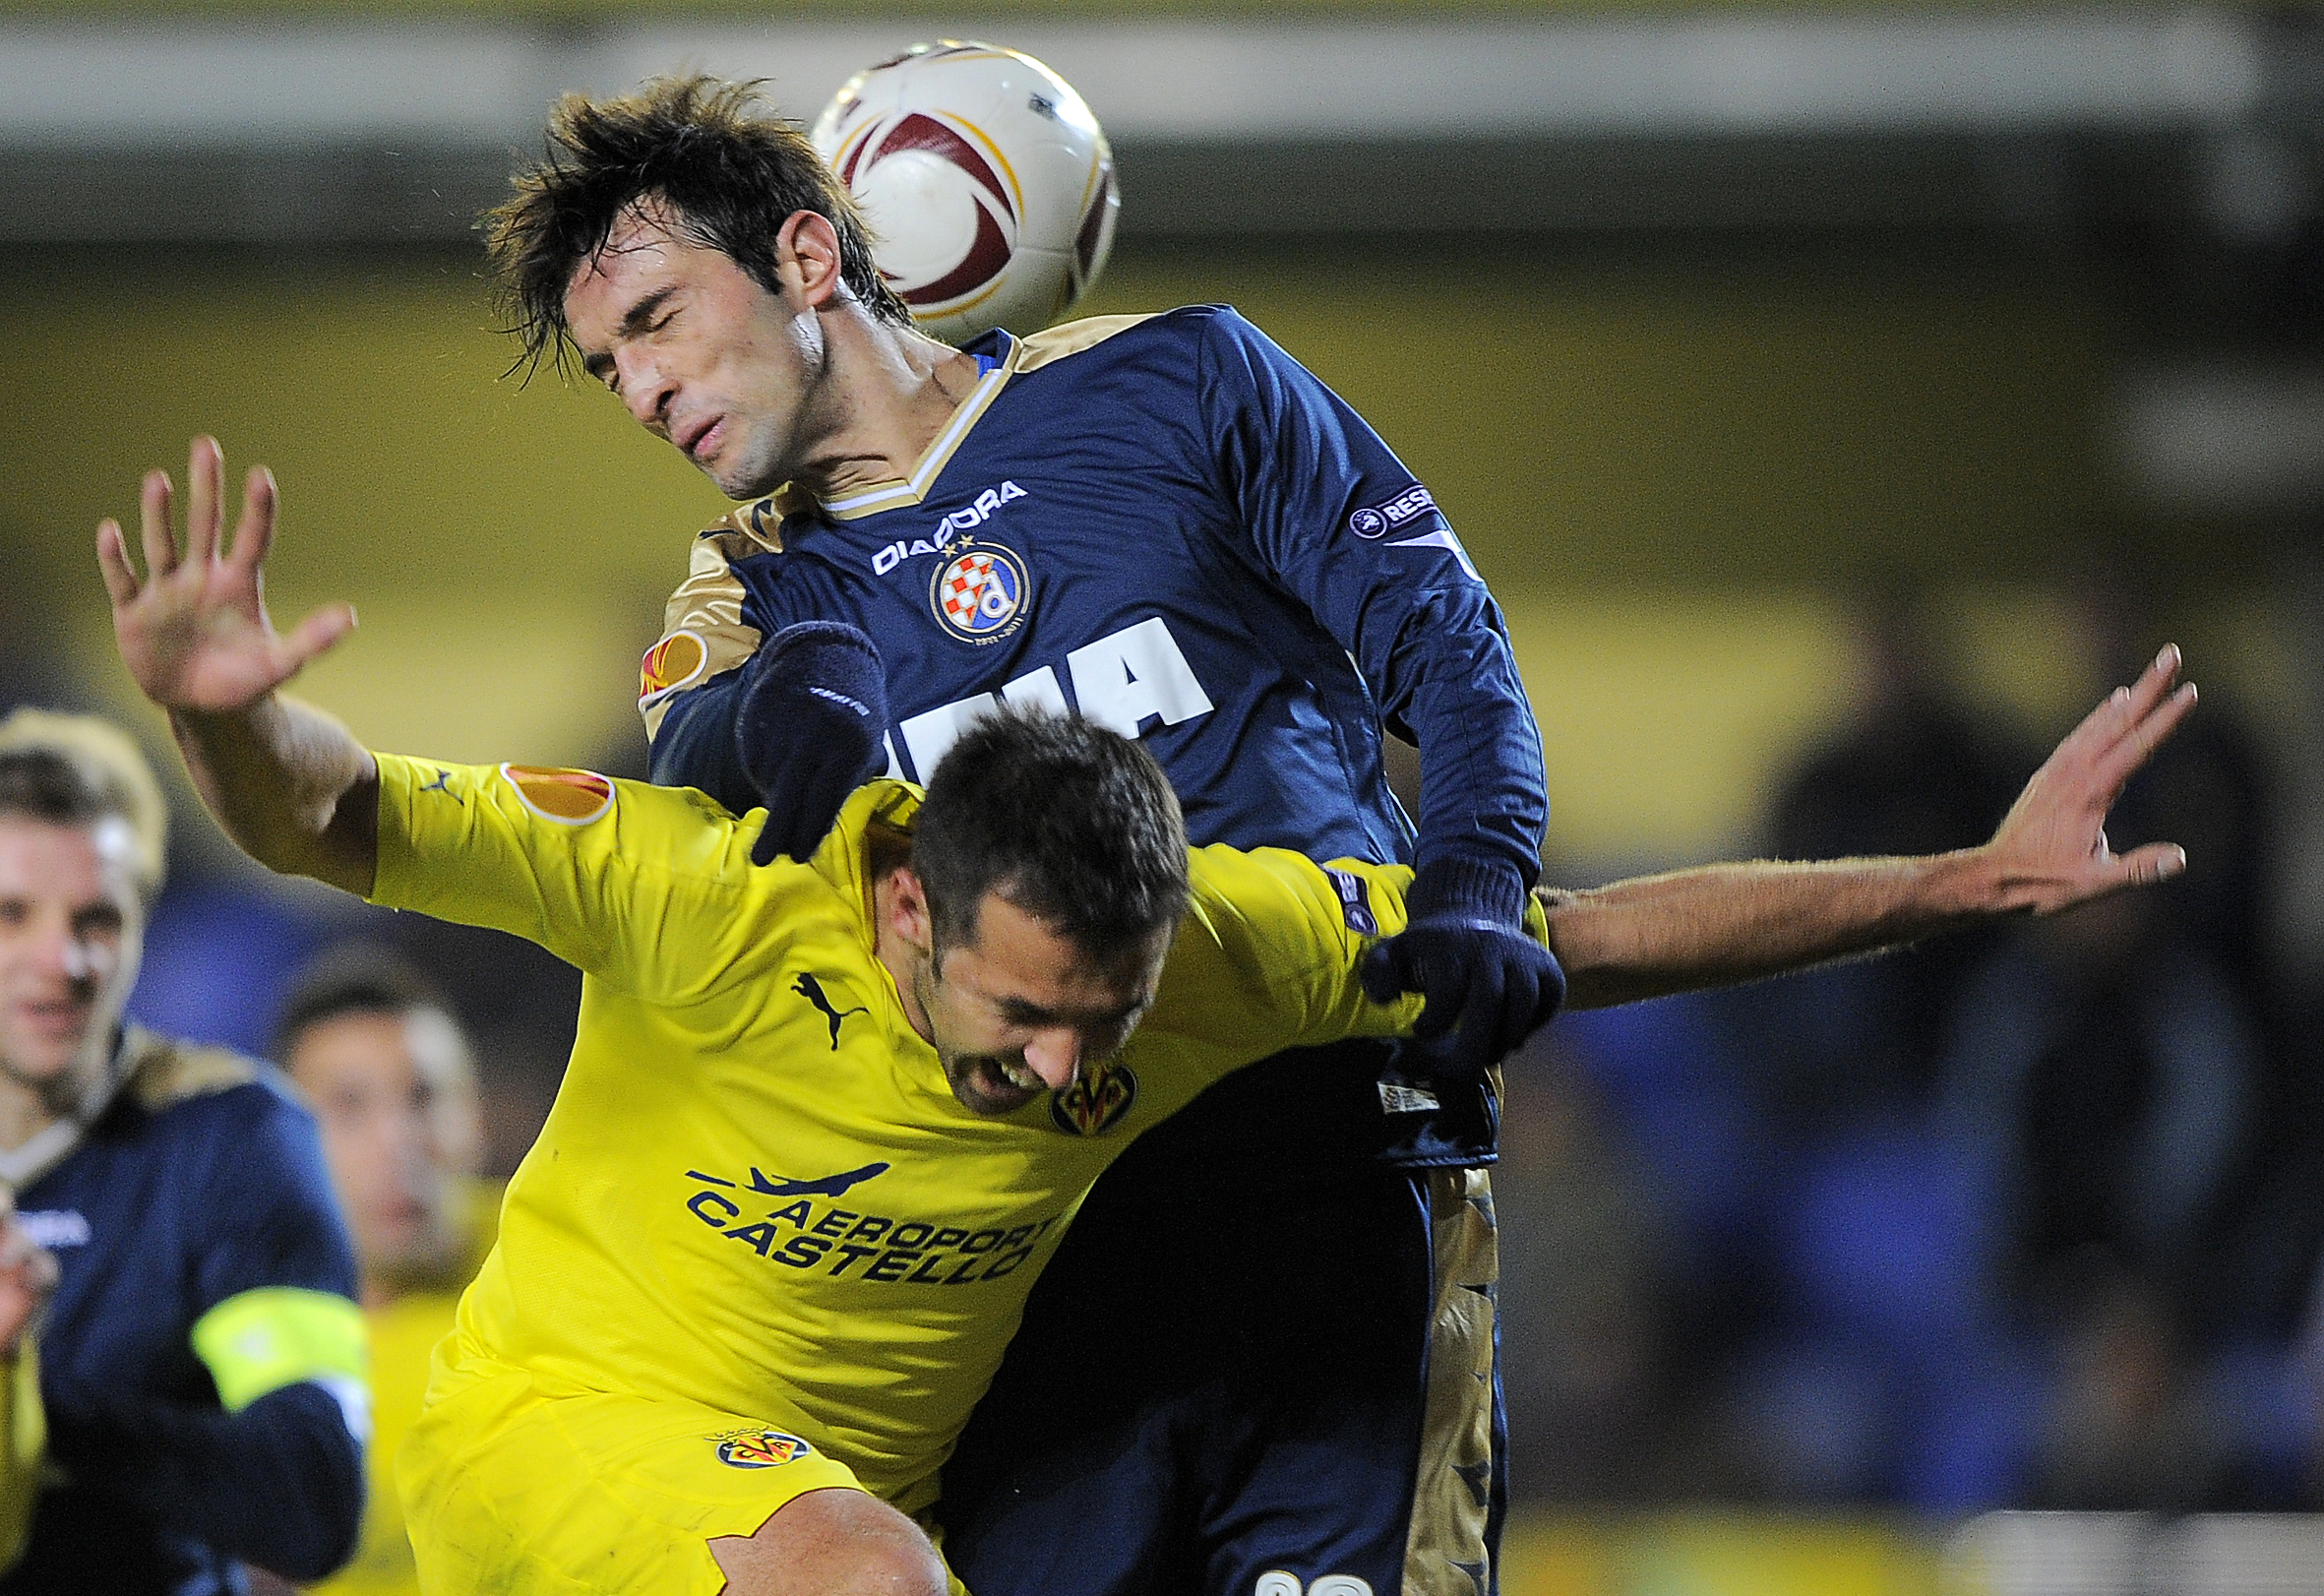 Villarreal's defender Carlos Marchena (B